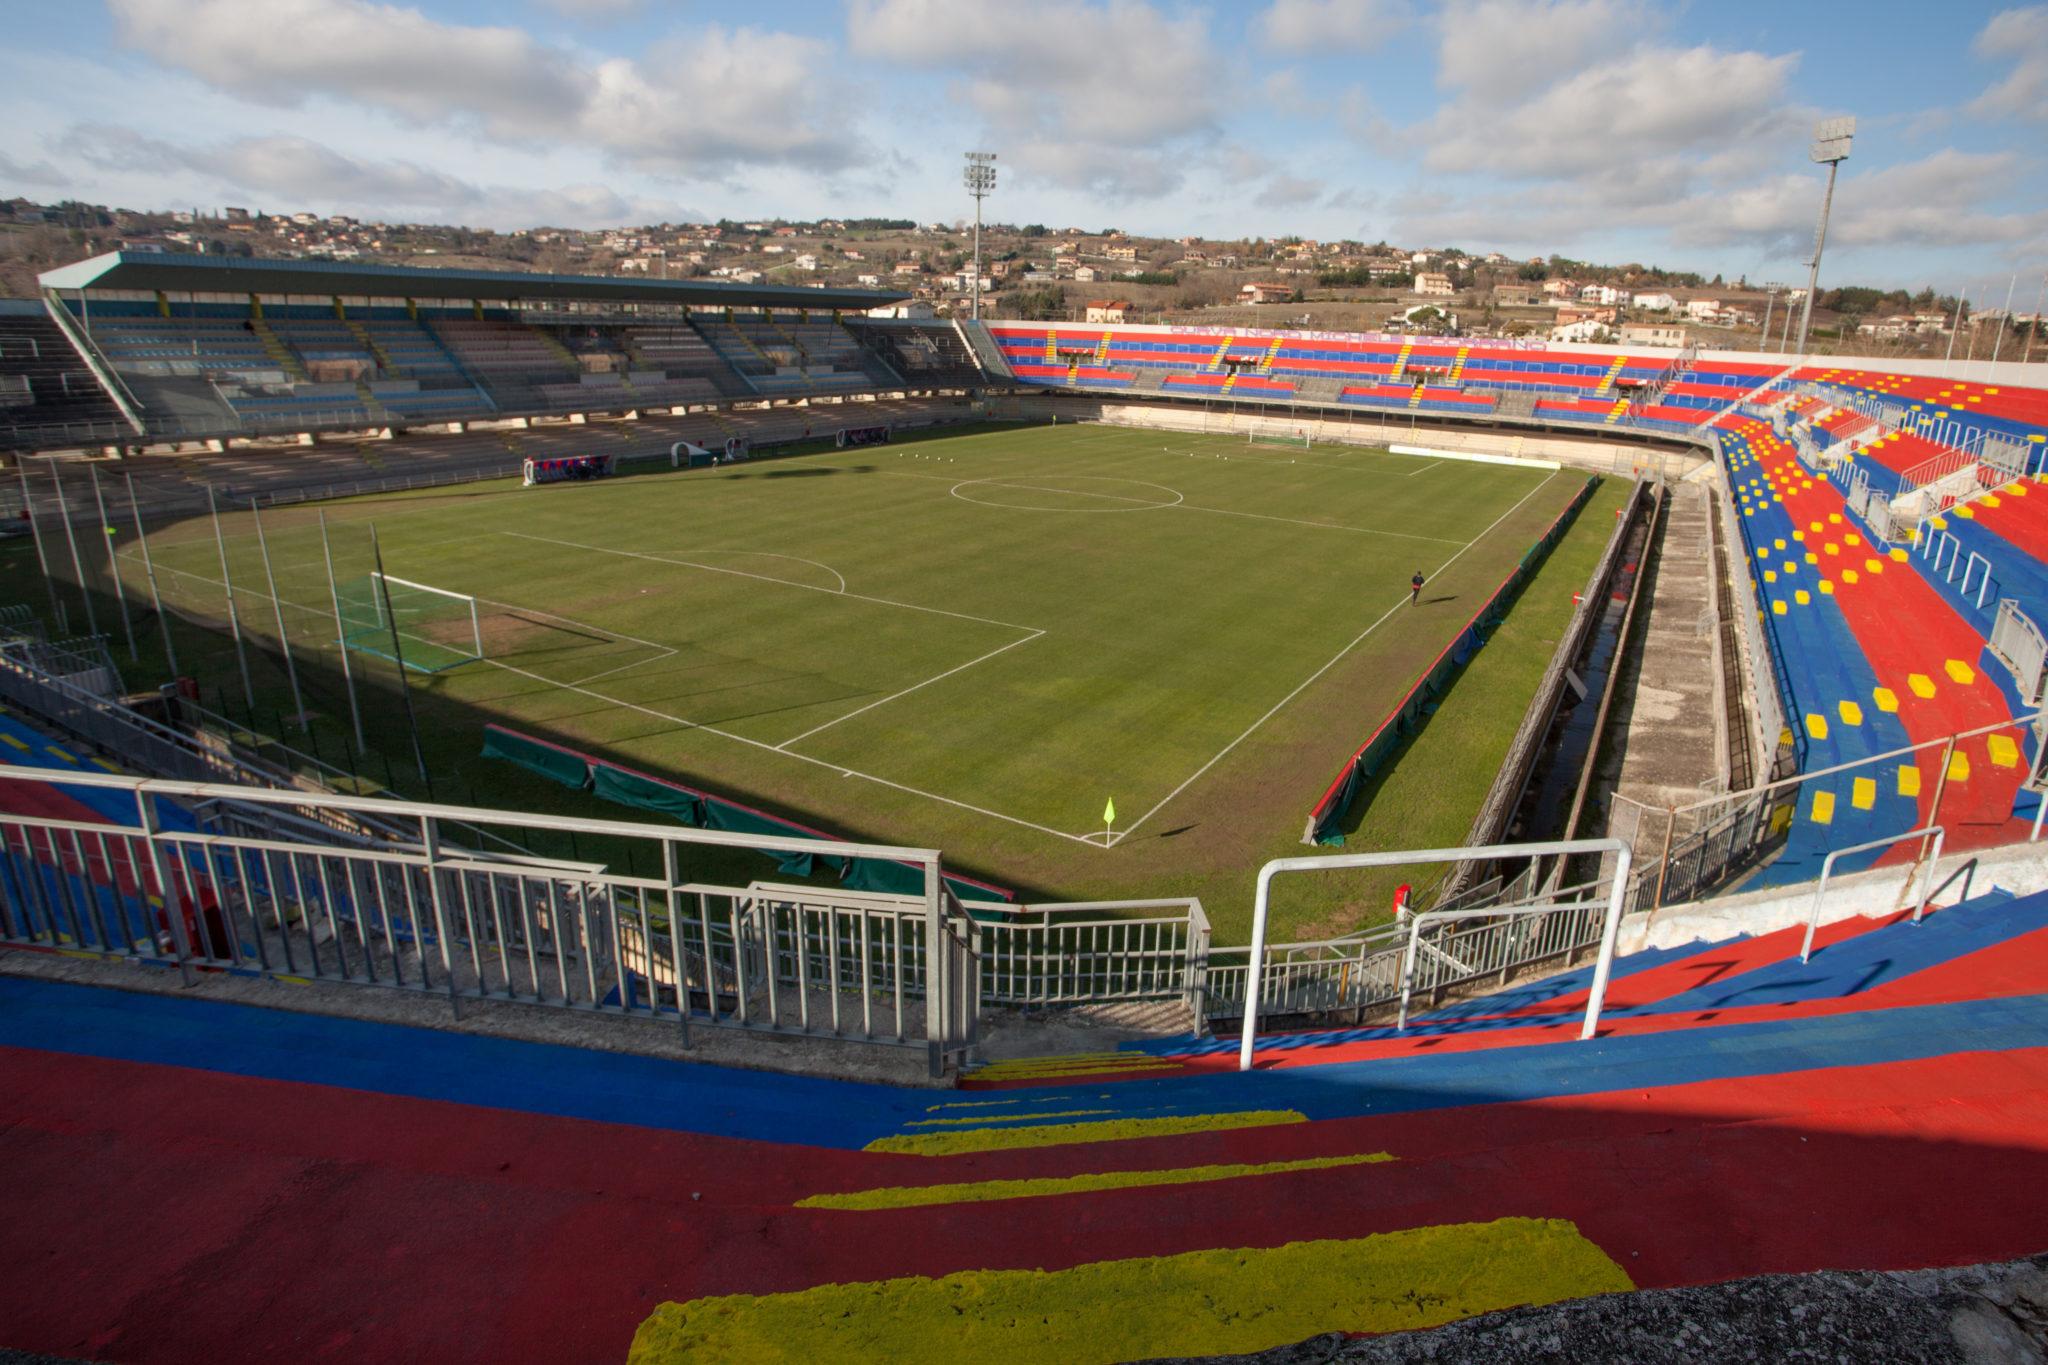 stadio nuovo romagnoli